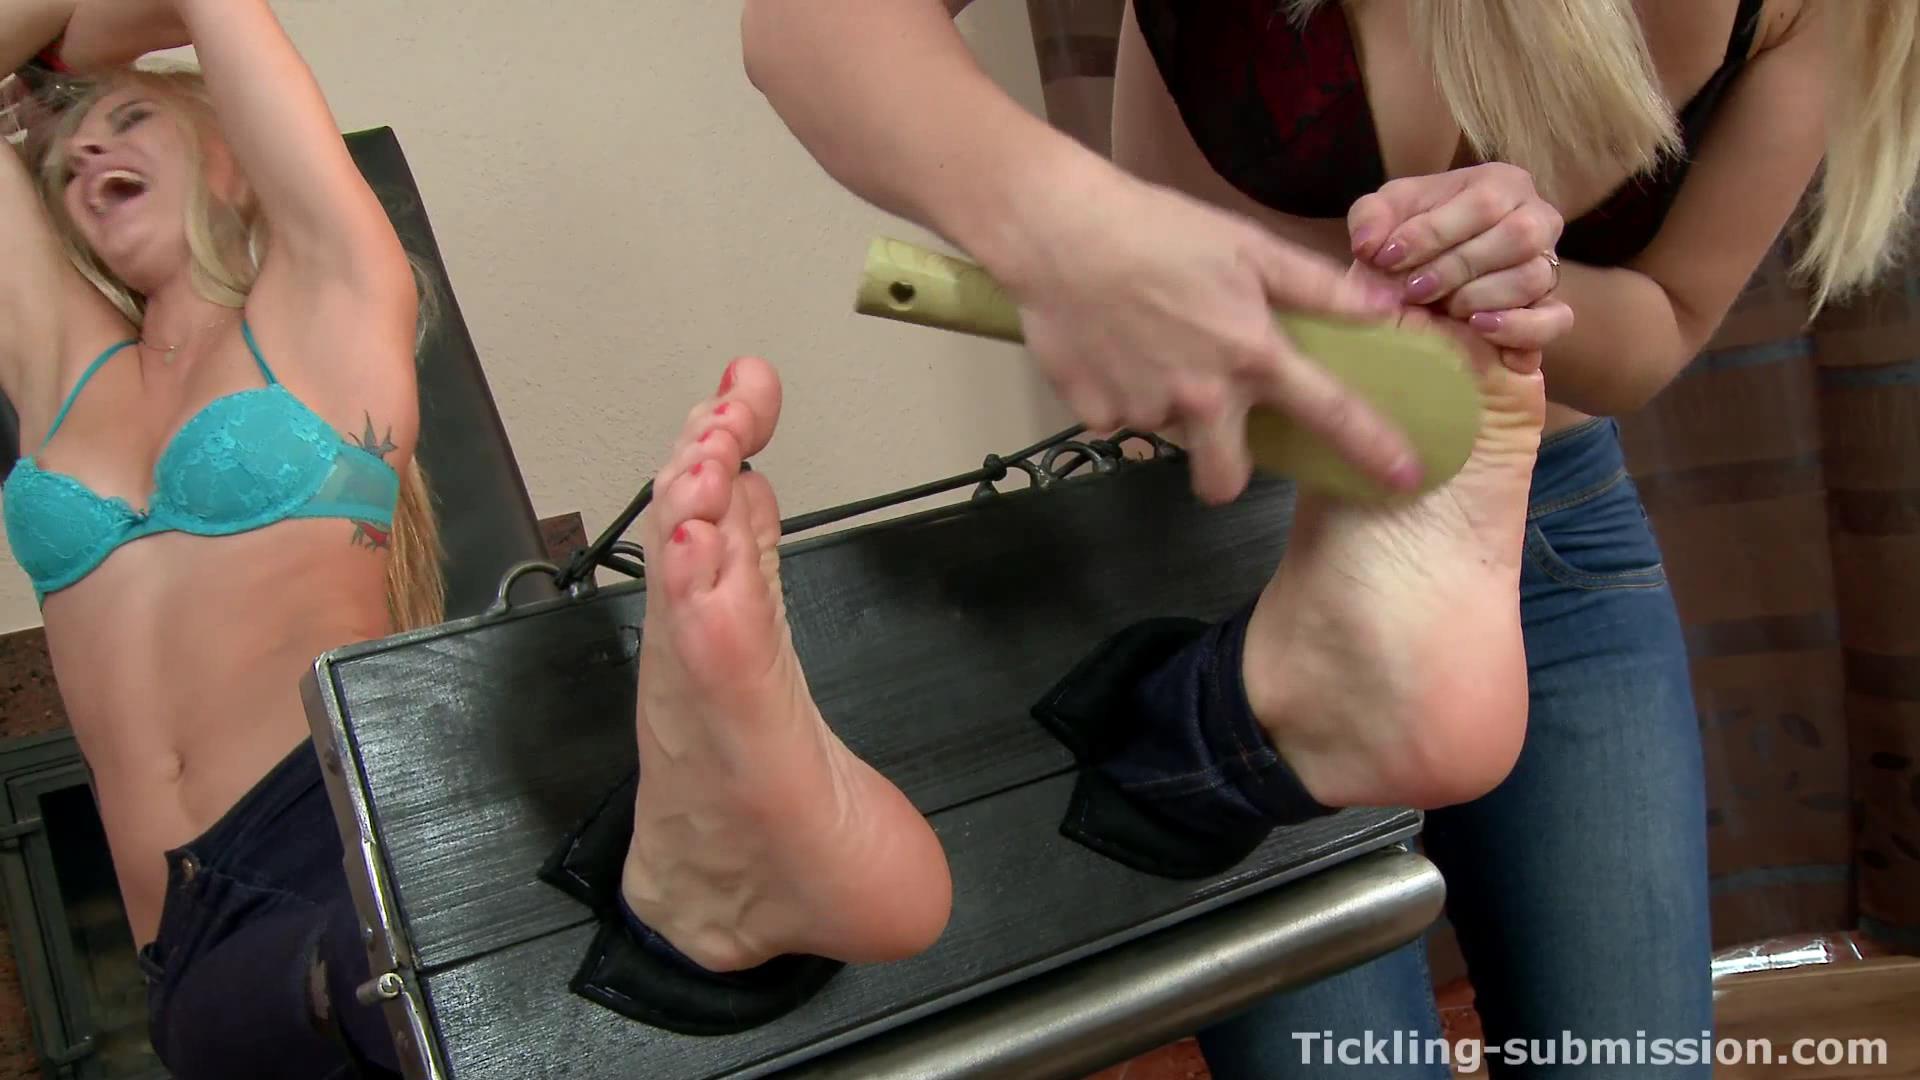 032 feet tickle torture episode 2 8